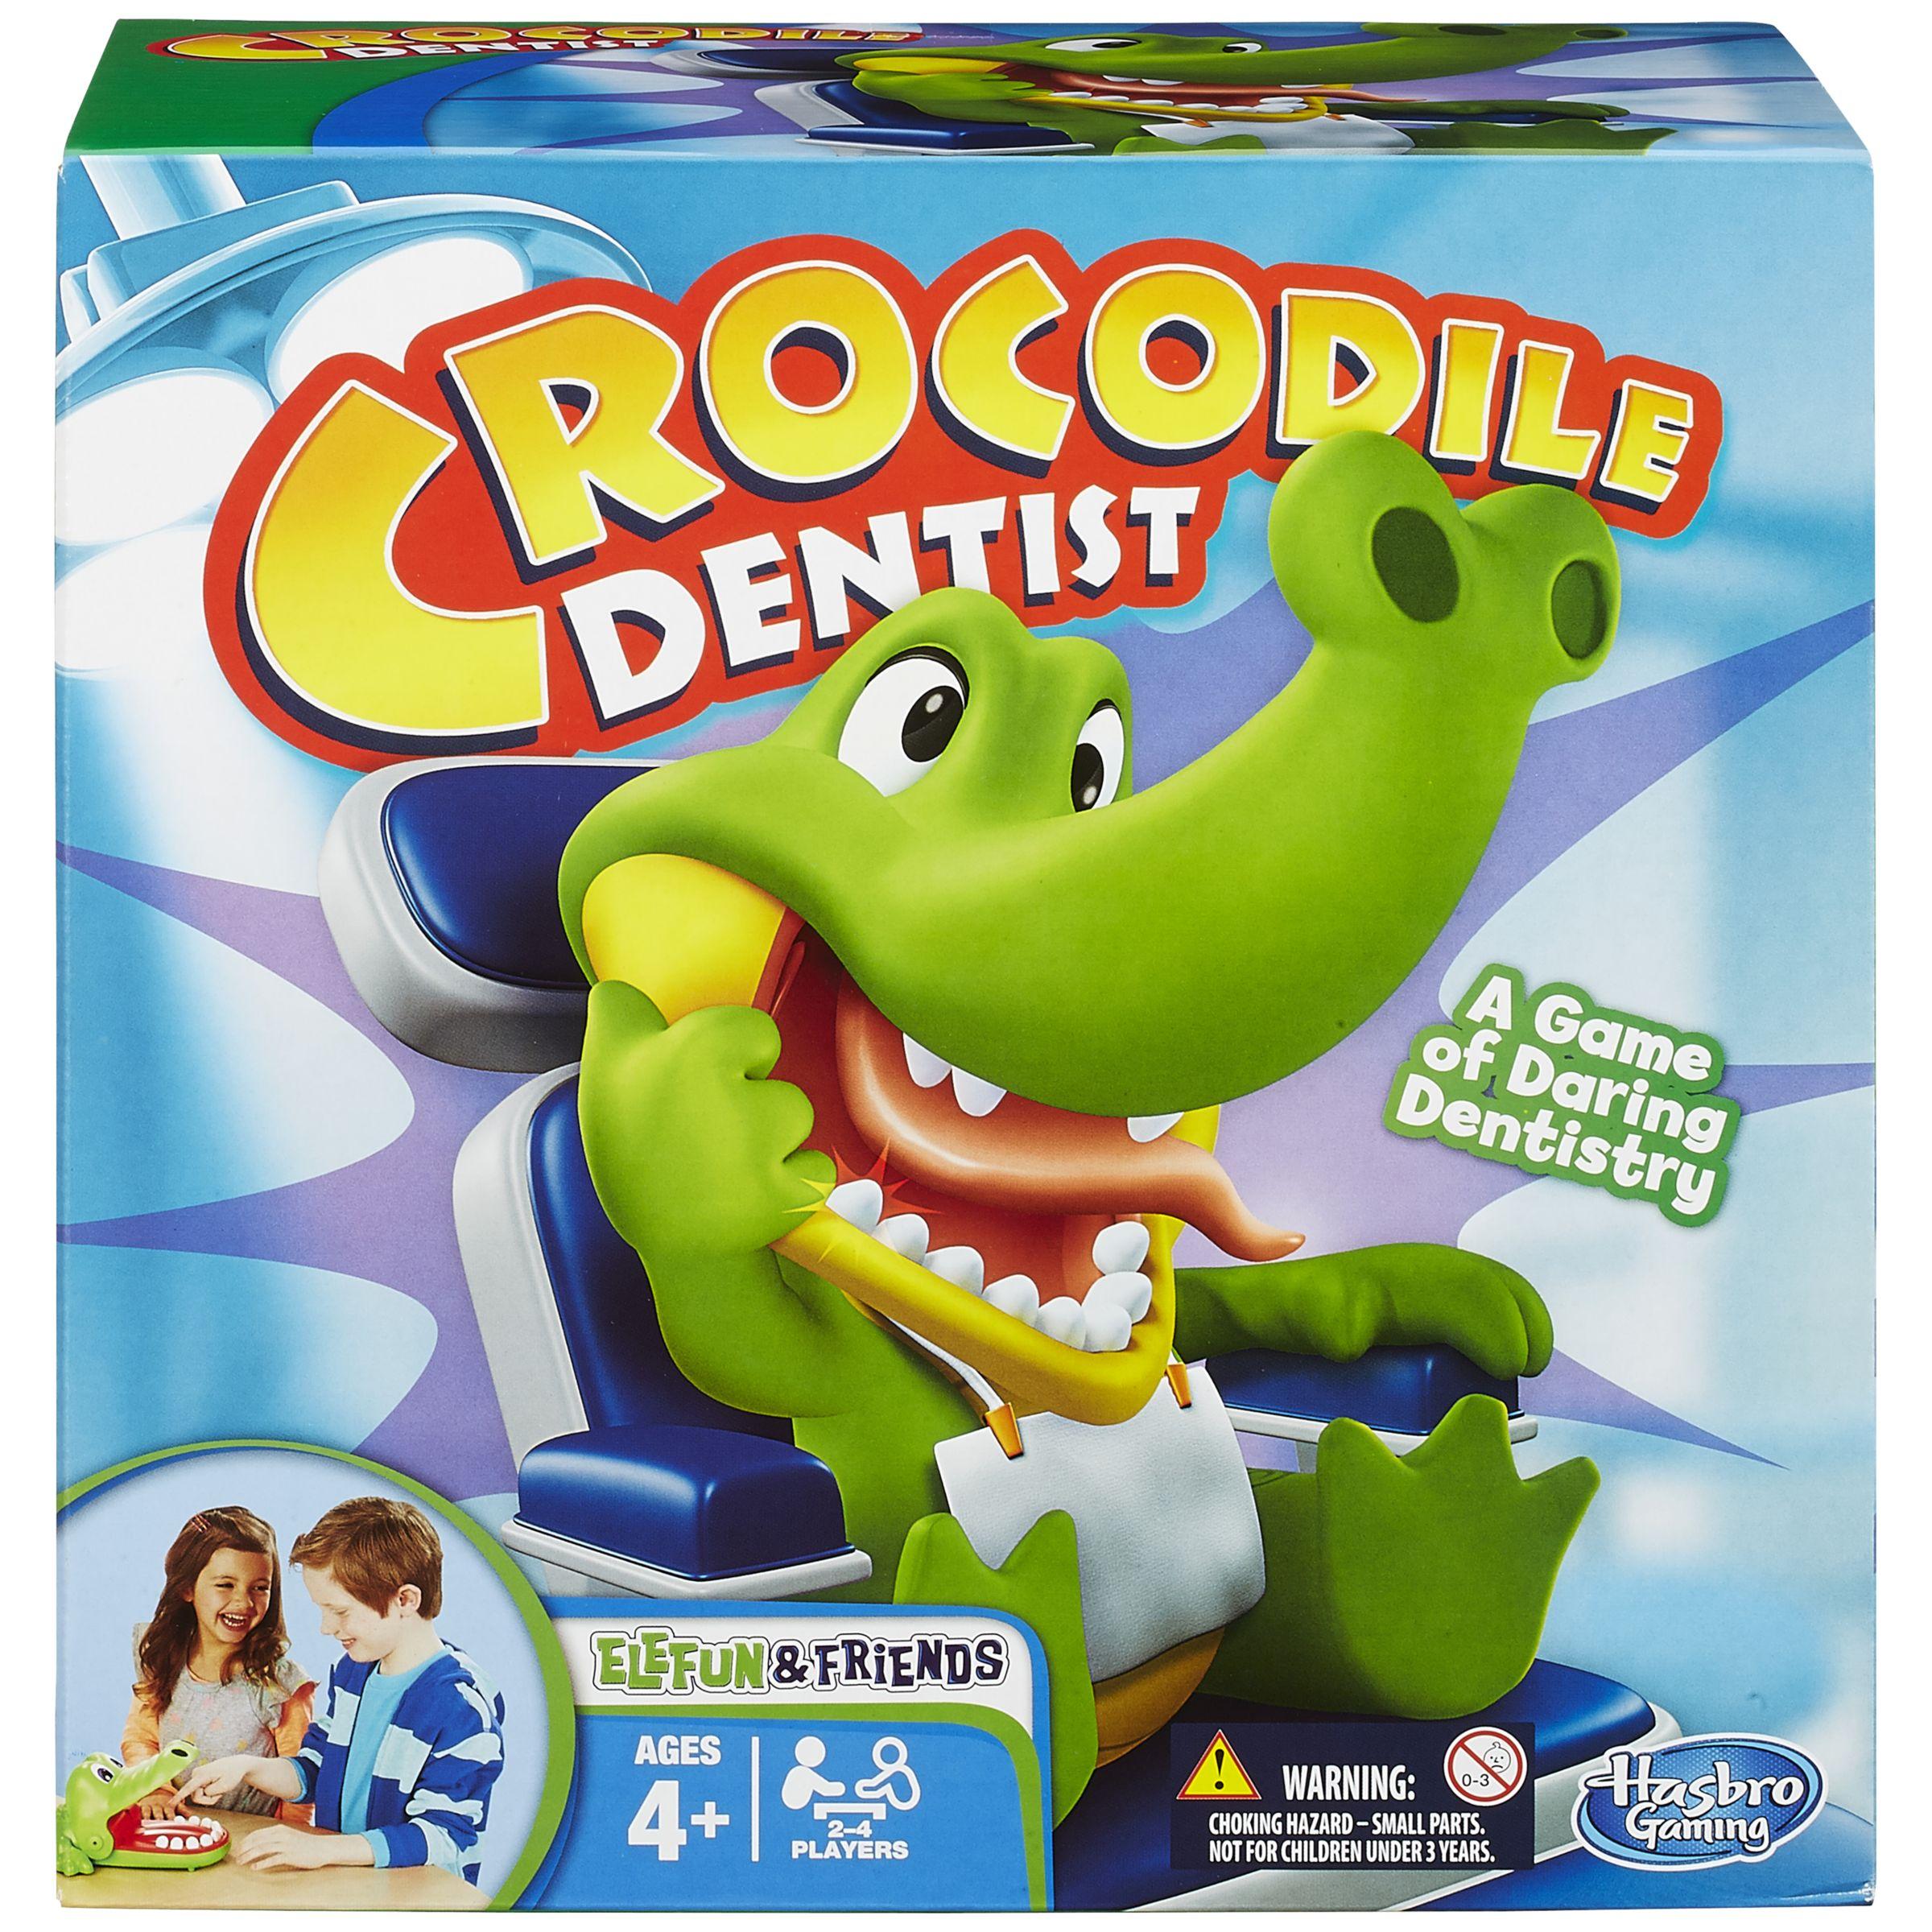 MB Games Crocodile Dentist Game